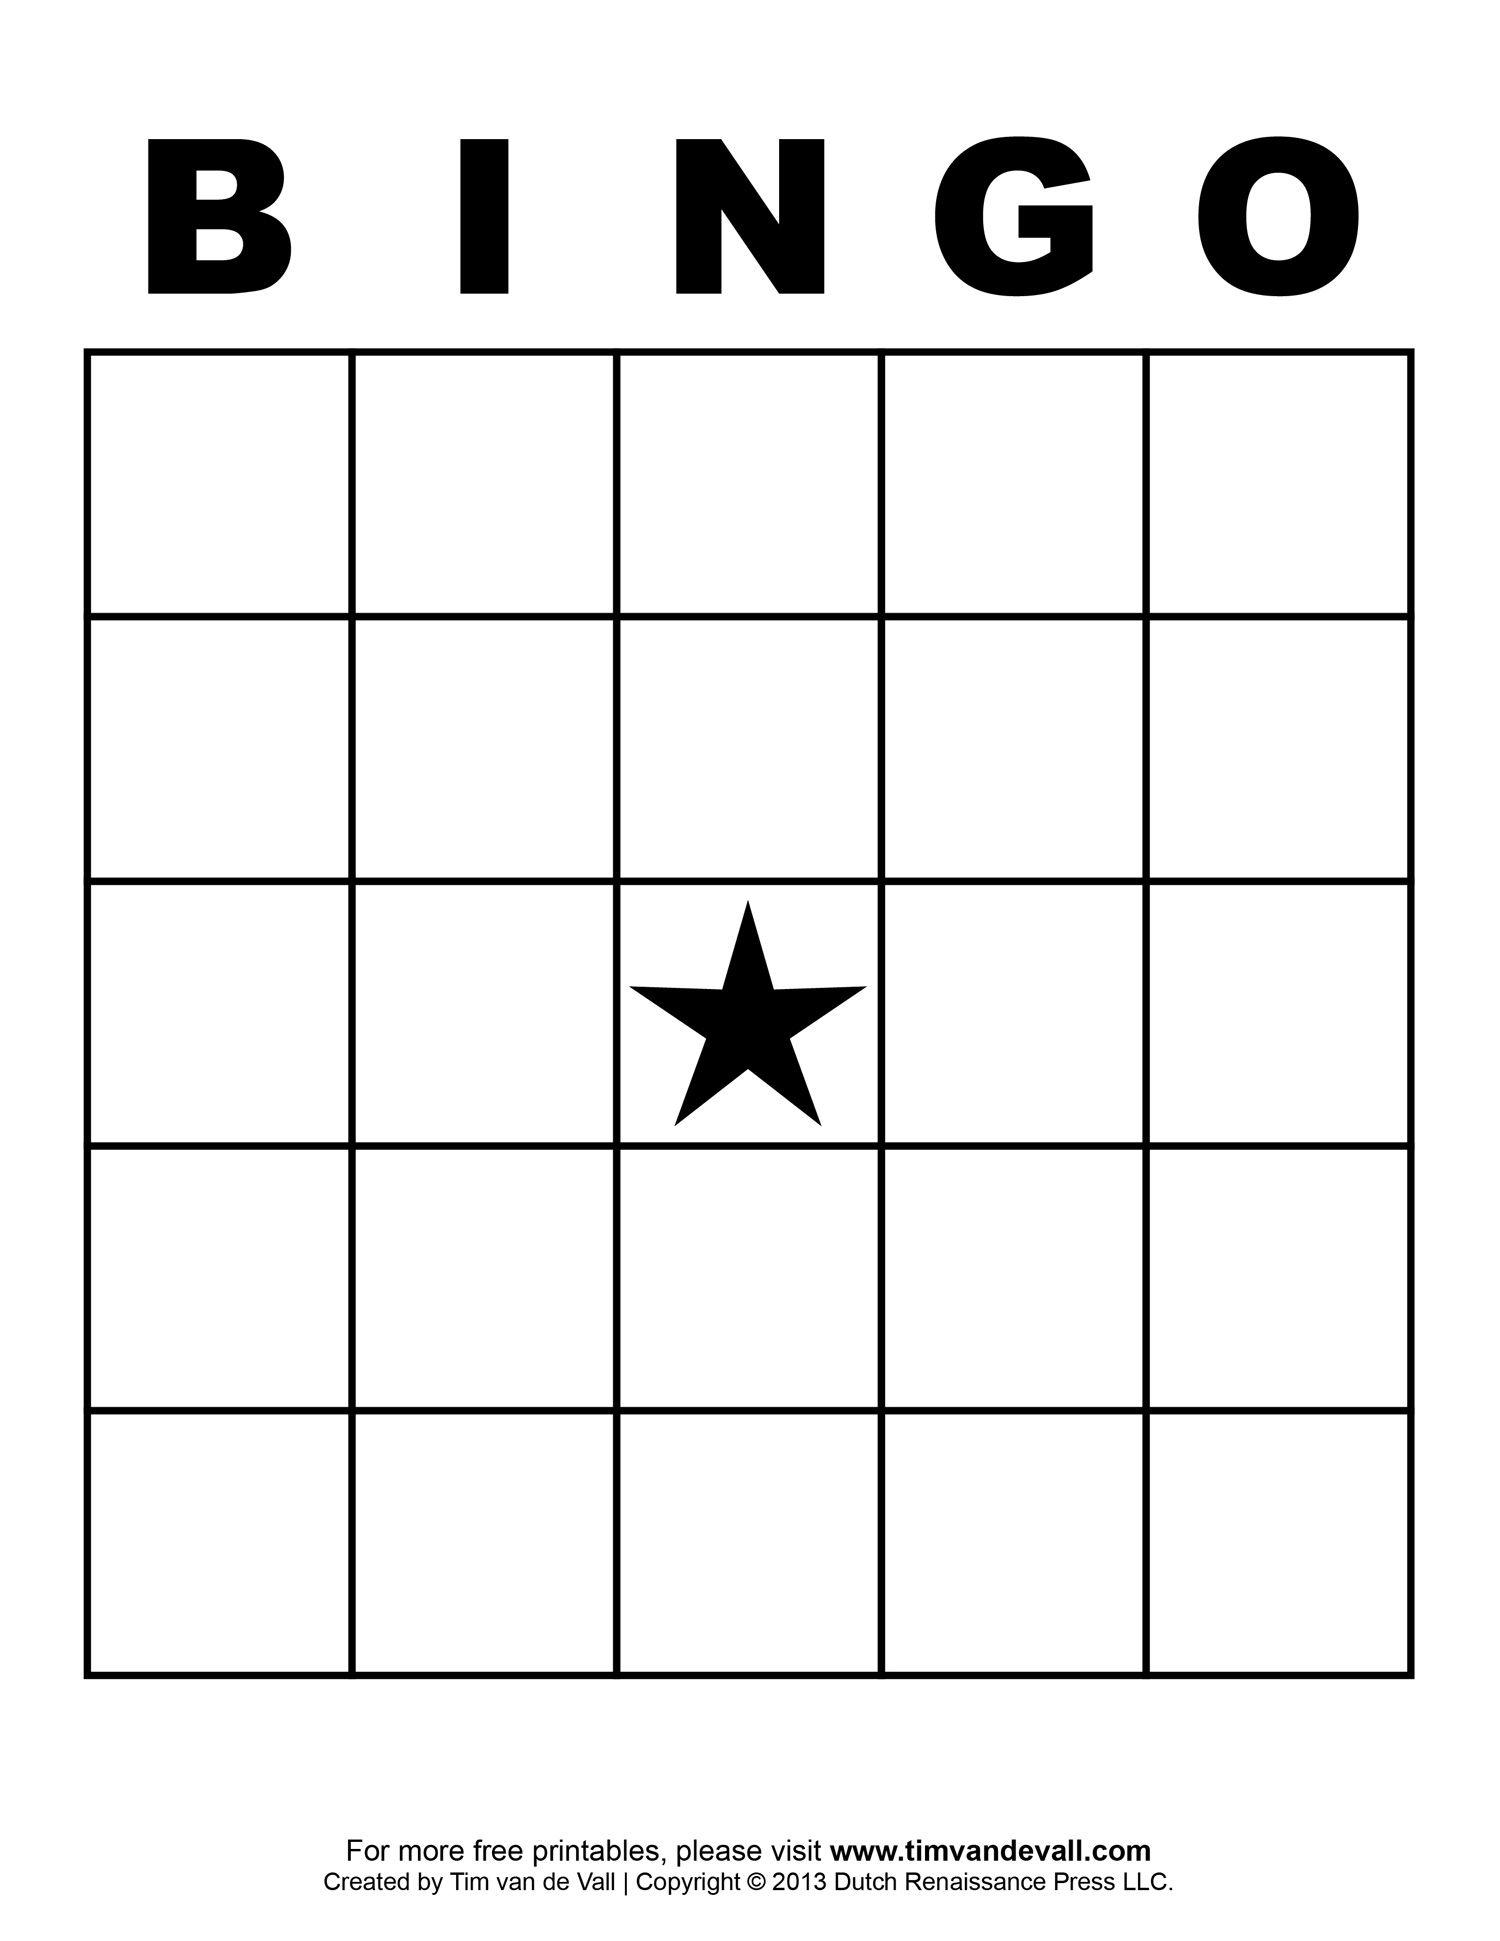 Free Printable Blank Bingo Cards Template 4 X 4 | Classroom | Sight - Free Printable Bingo Cards